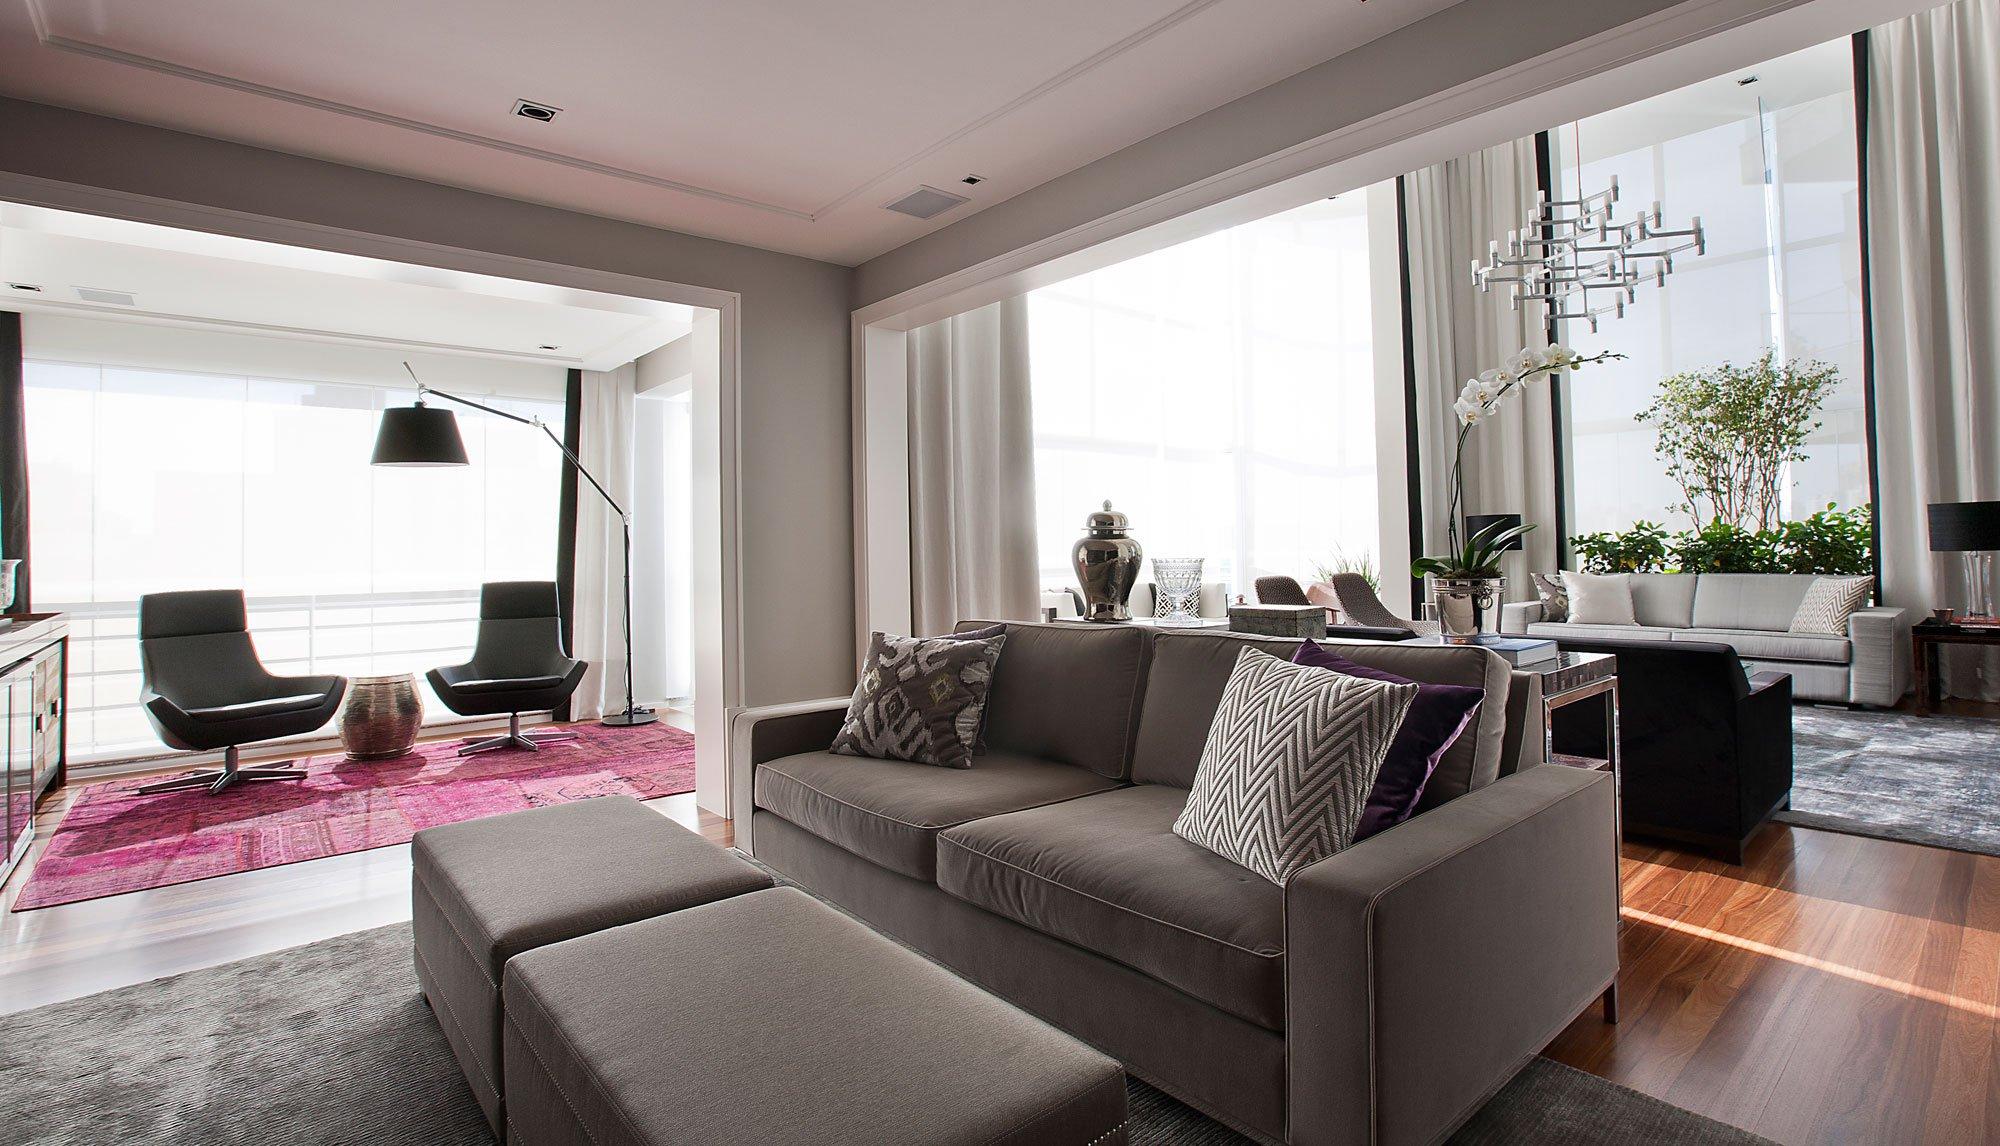 An-Elegant-Interior-10